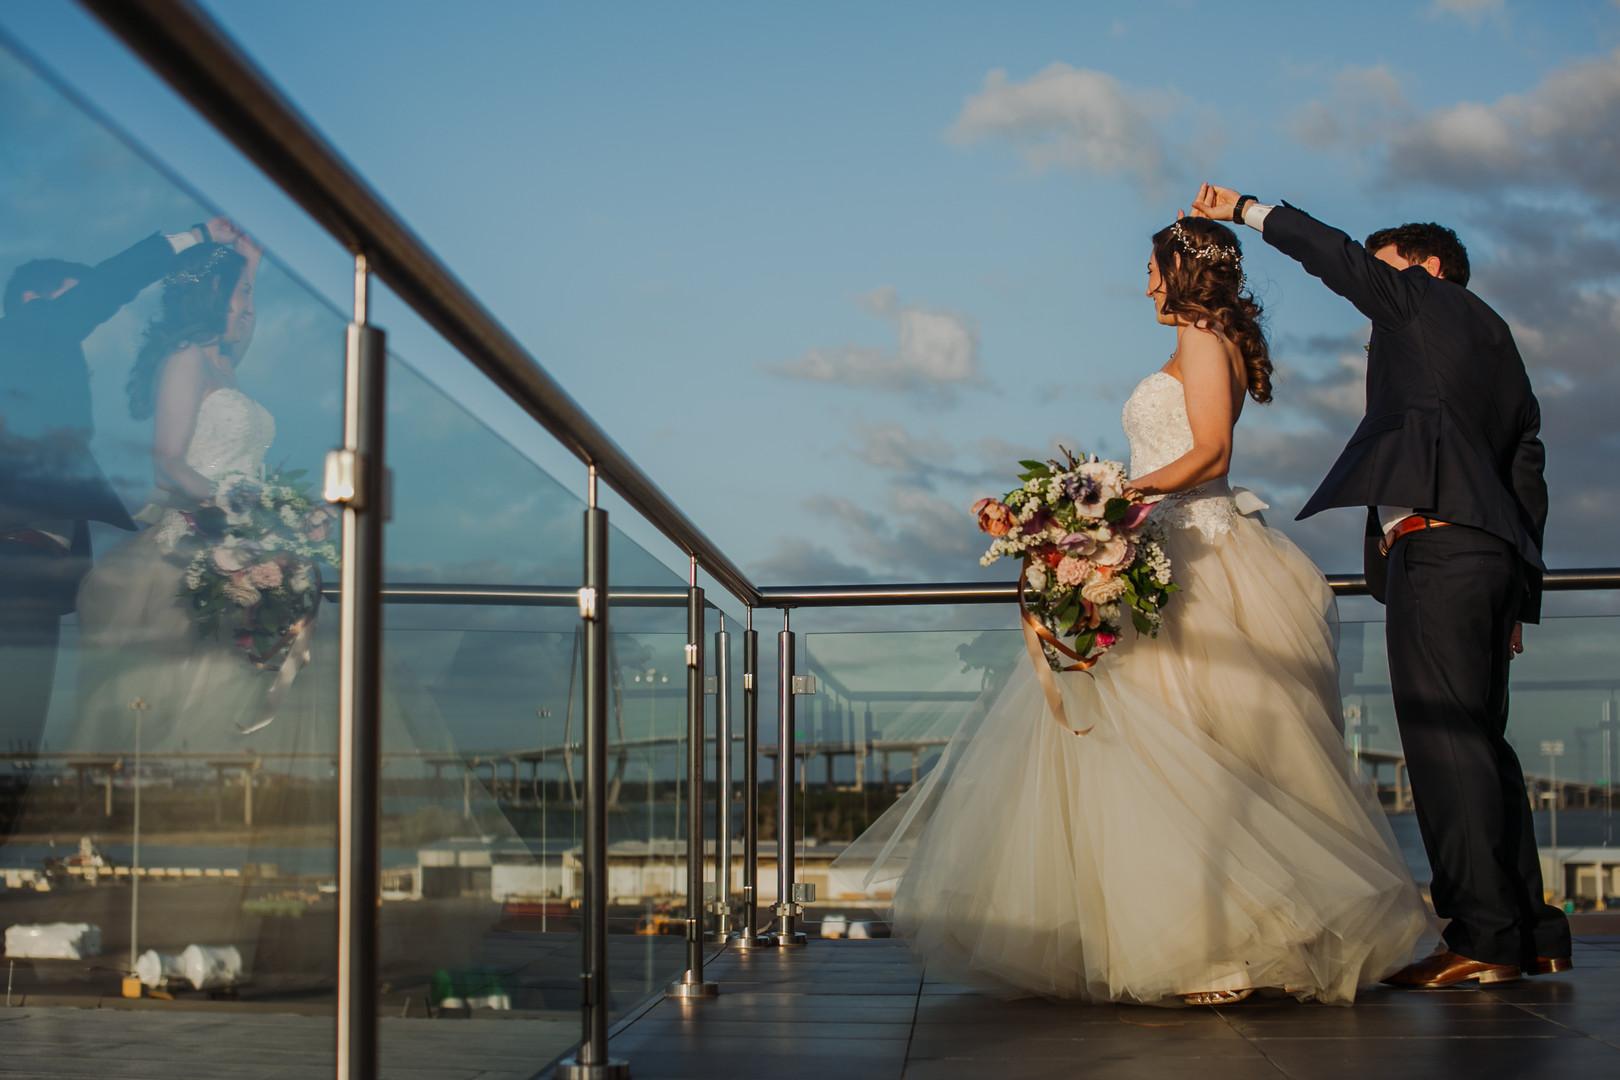 cedar-room-wedding-31.jpg